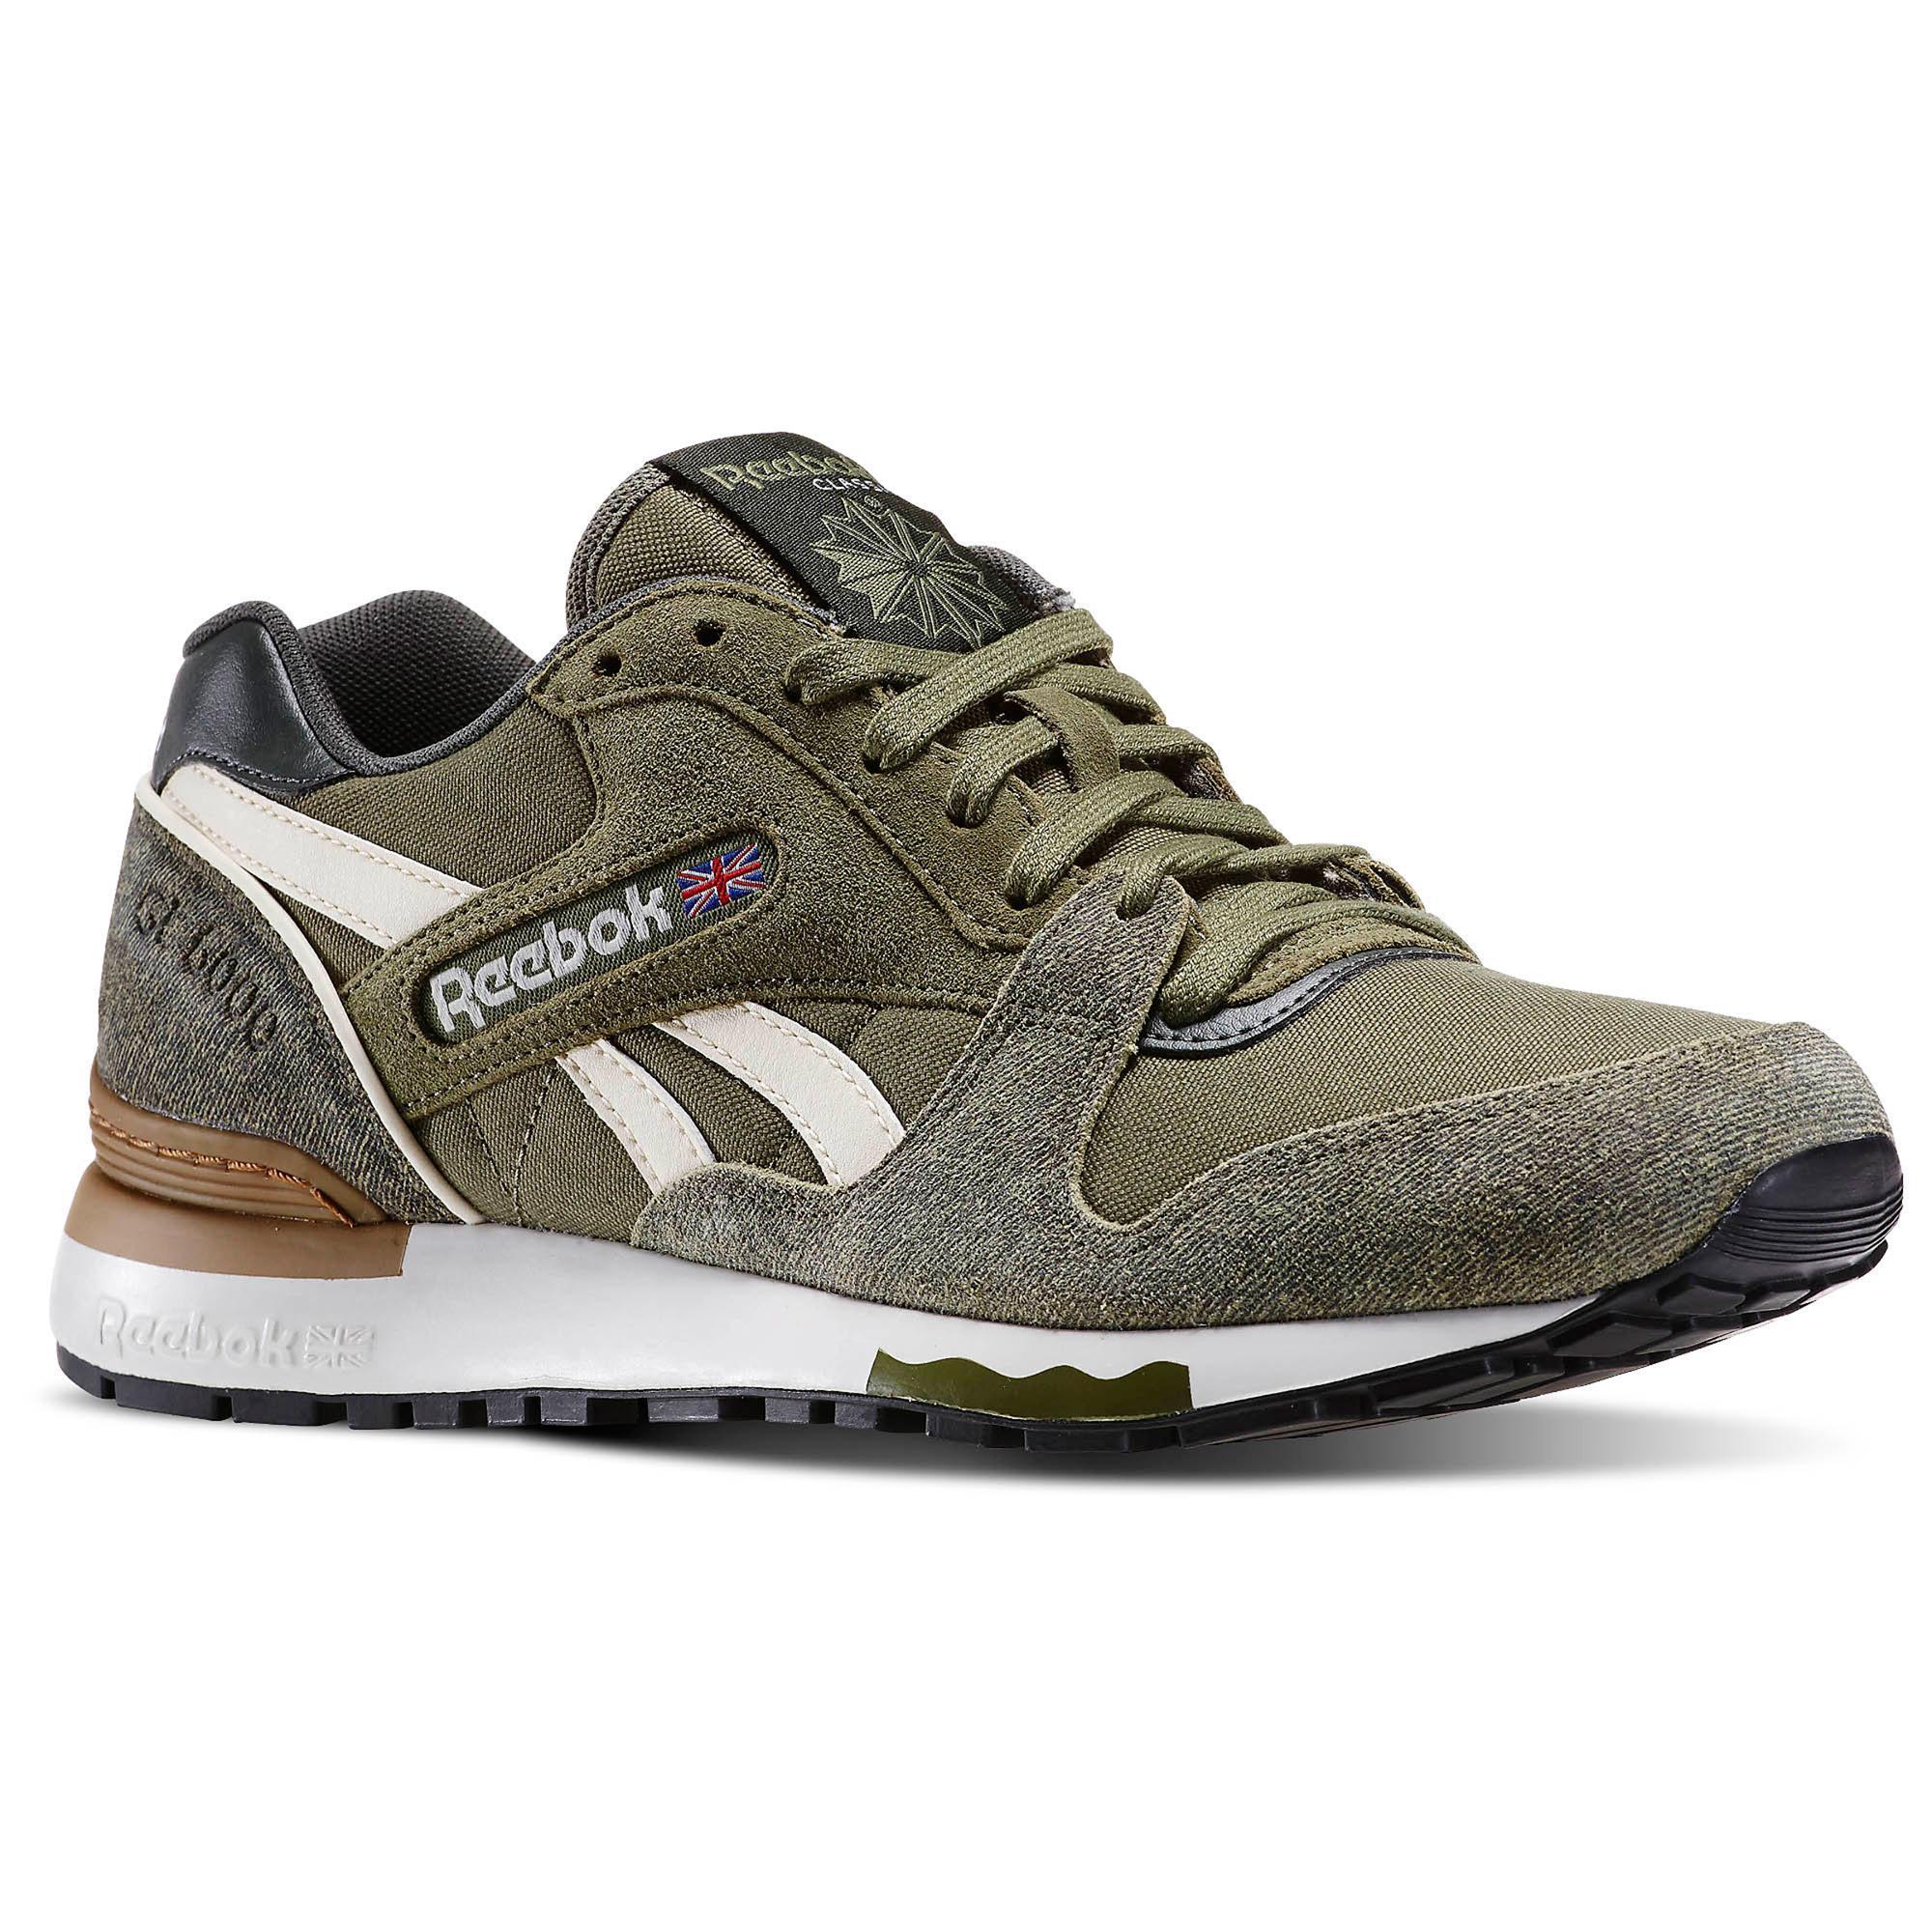 Sélection de chaussures Reebok en promo - Ex : Reebok GL 6000 ND